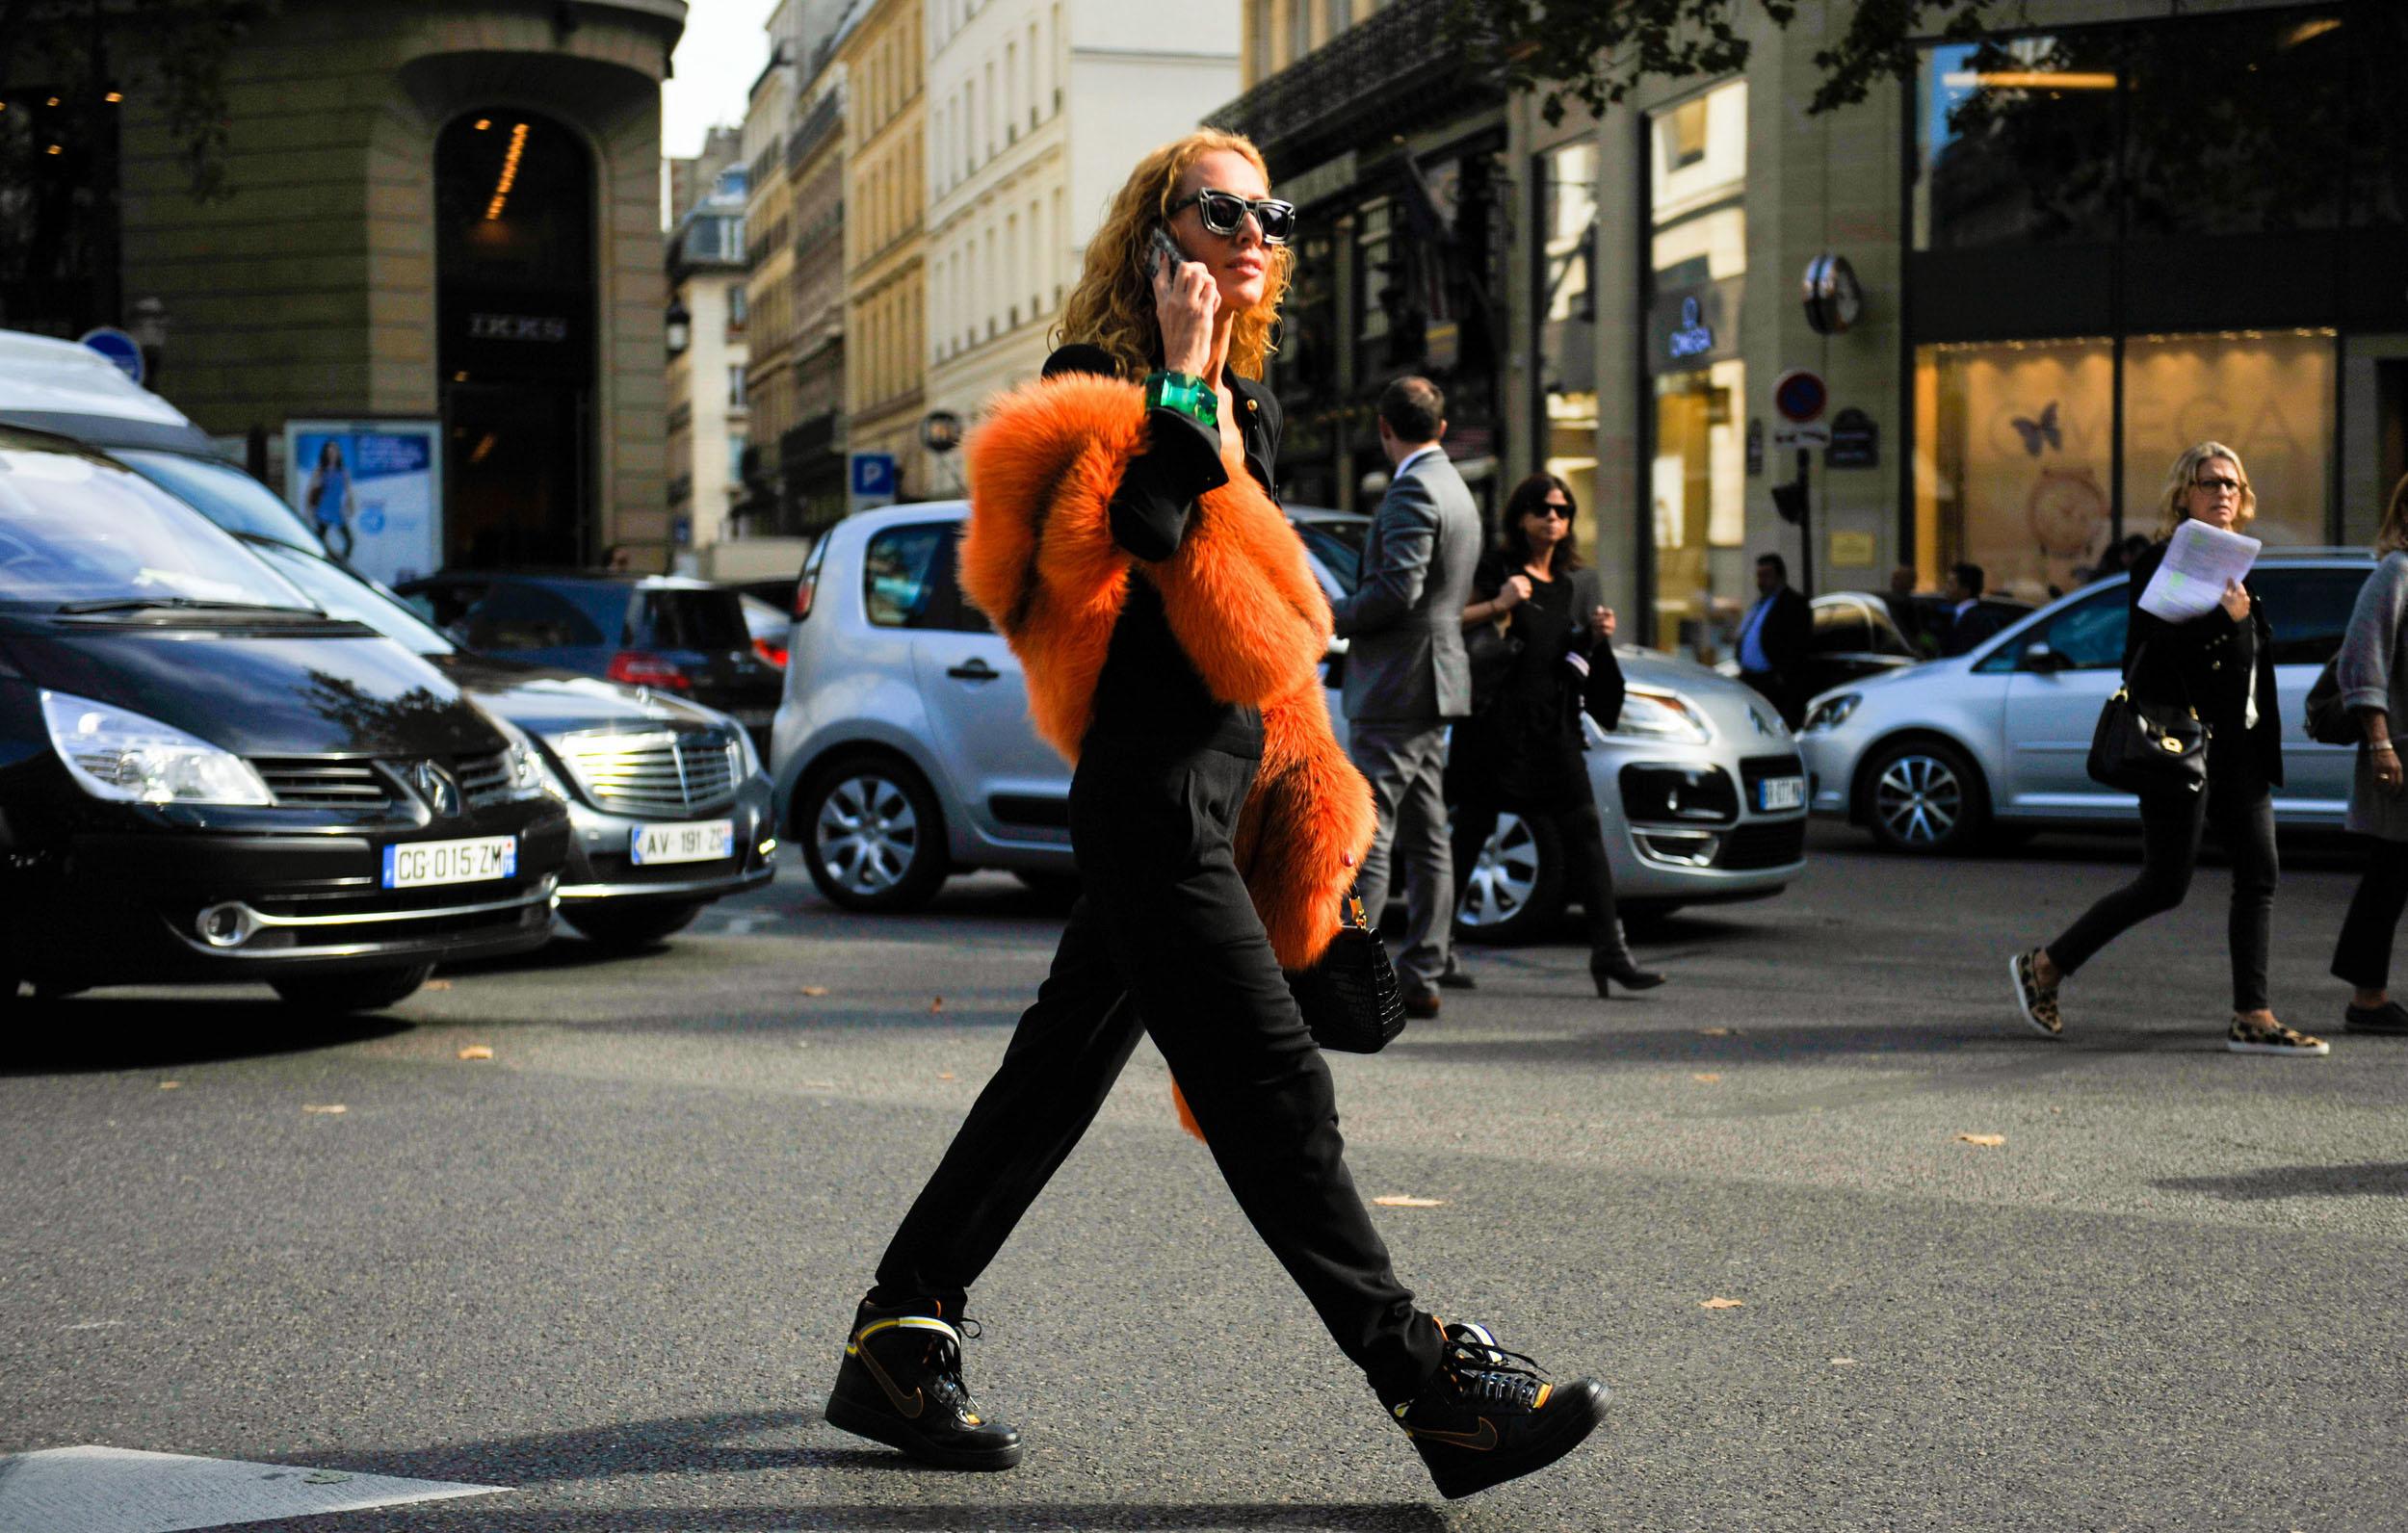 StreetStyle_ParisFashionWeek_LeandroJusten_068.jpg